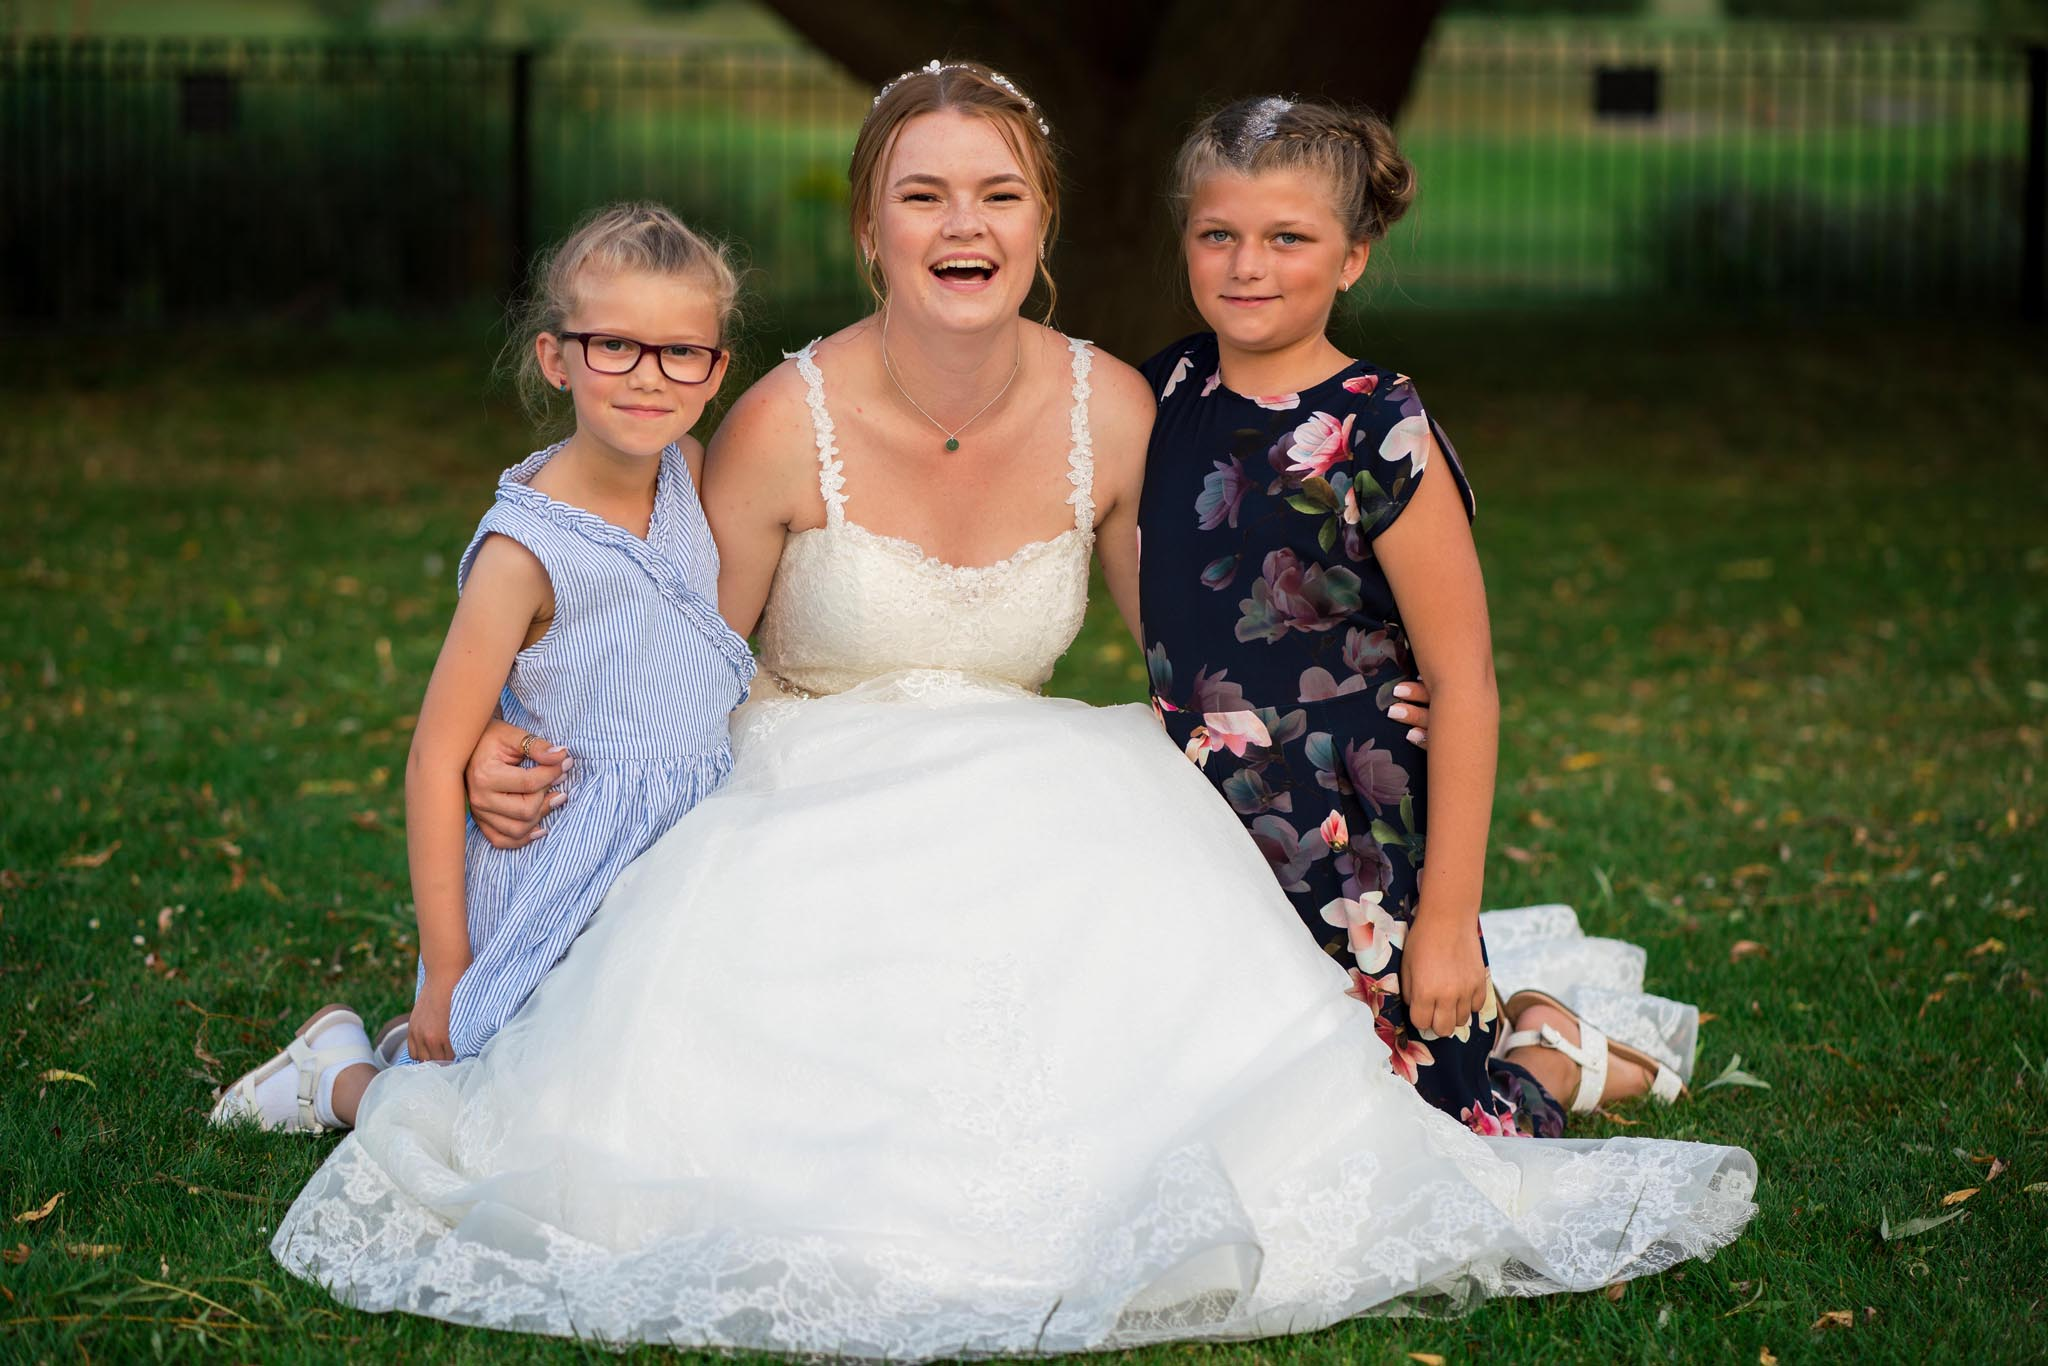 778-family-friends-Luke-Yasmin-The-Rayleigh-Club-Wedding-Photography.jpg